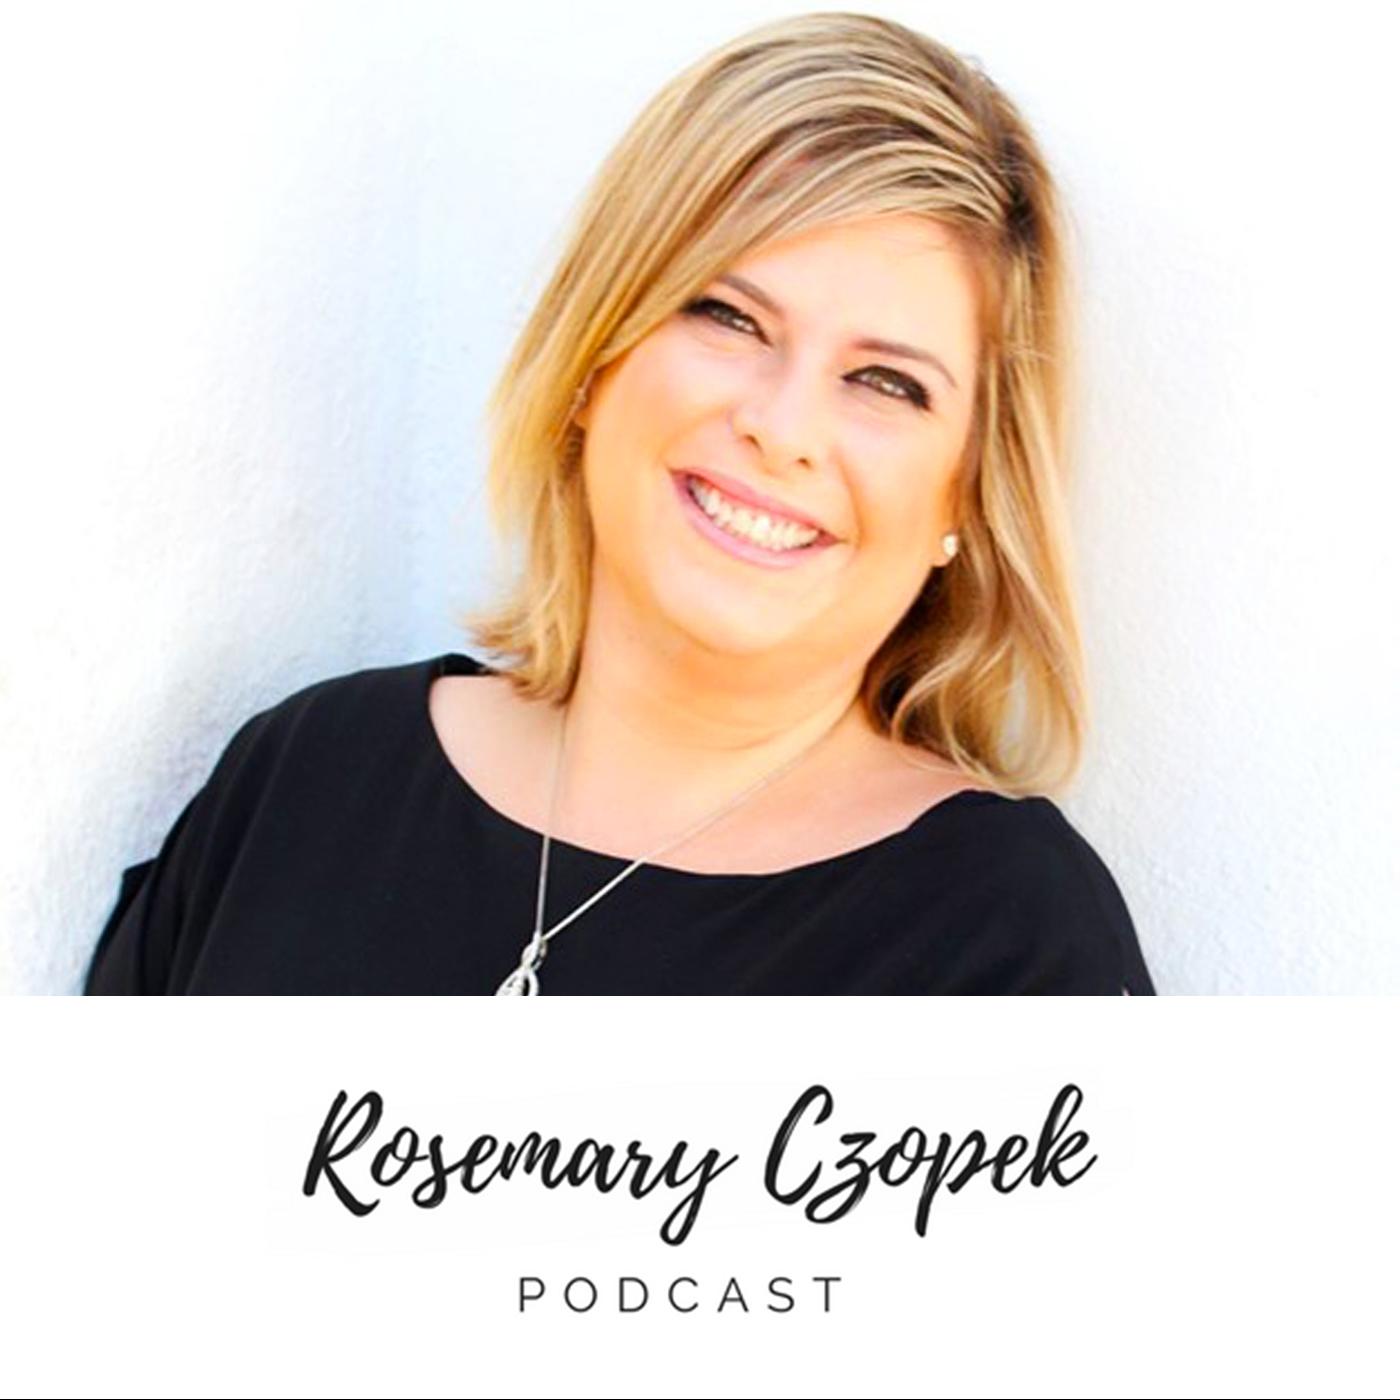 Rosemary Czopek Podcast show art